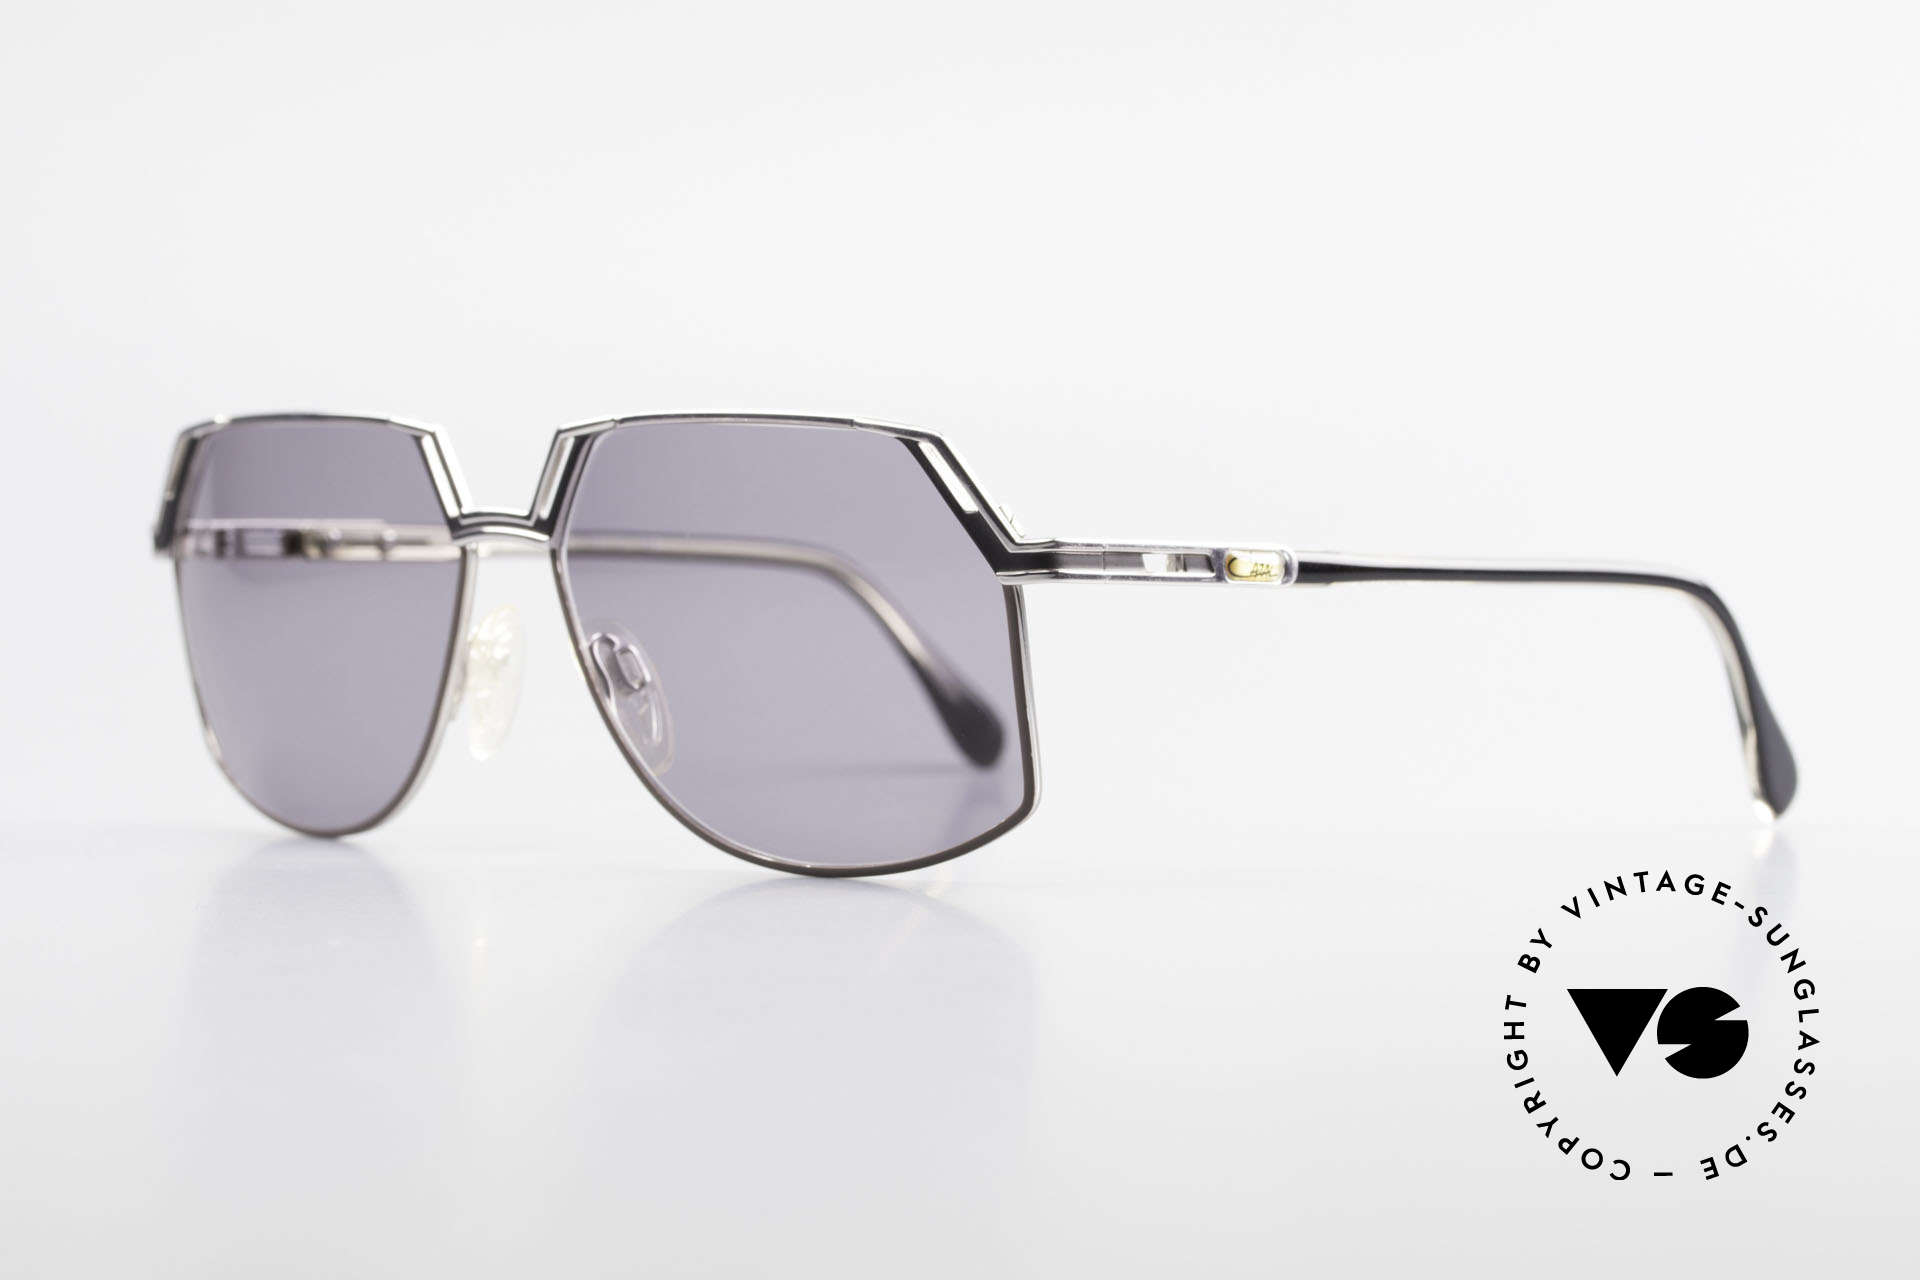 Cazal 738 True Vintage Sunglasses, never worn, NOS (like all our old vintage Cazal glasses), Made for Men